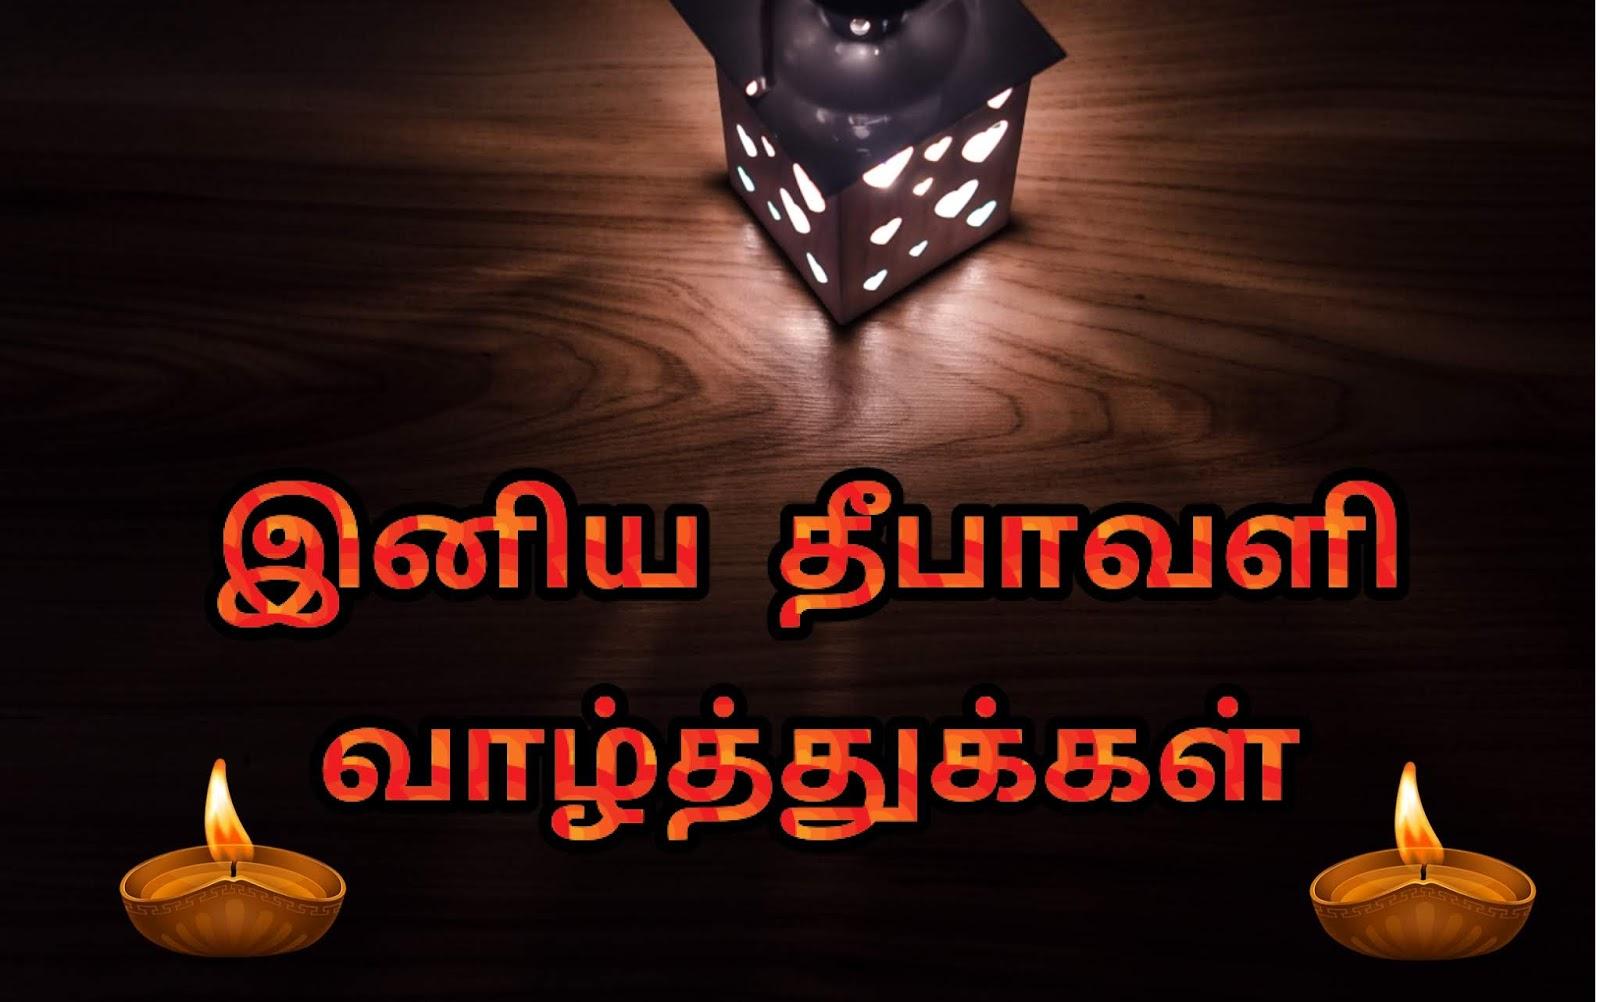 Happy Diwali Greetings In Tamil 2018 Language Text Font Script